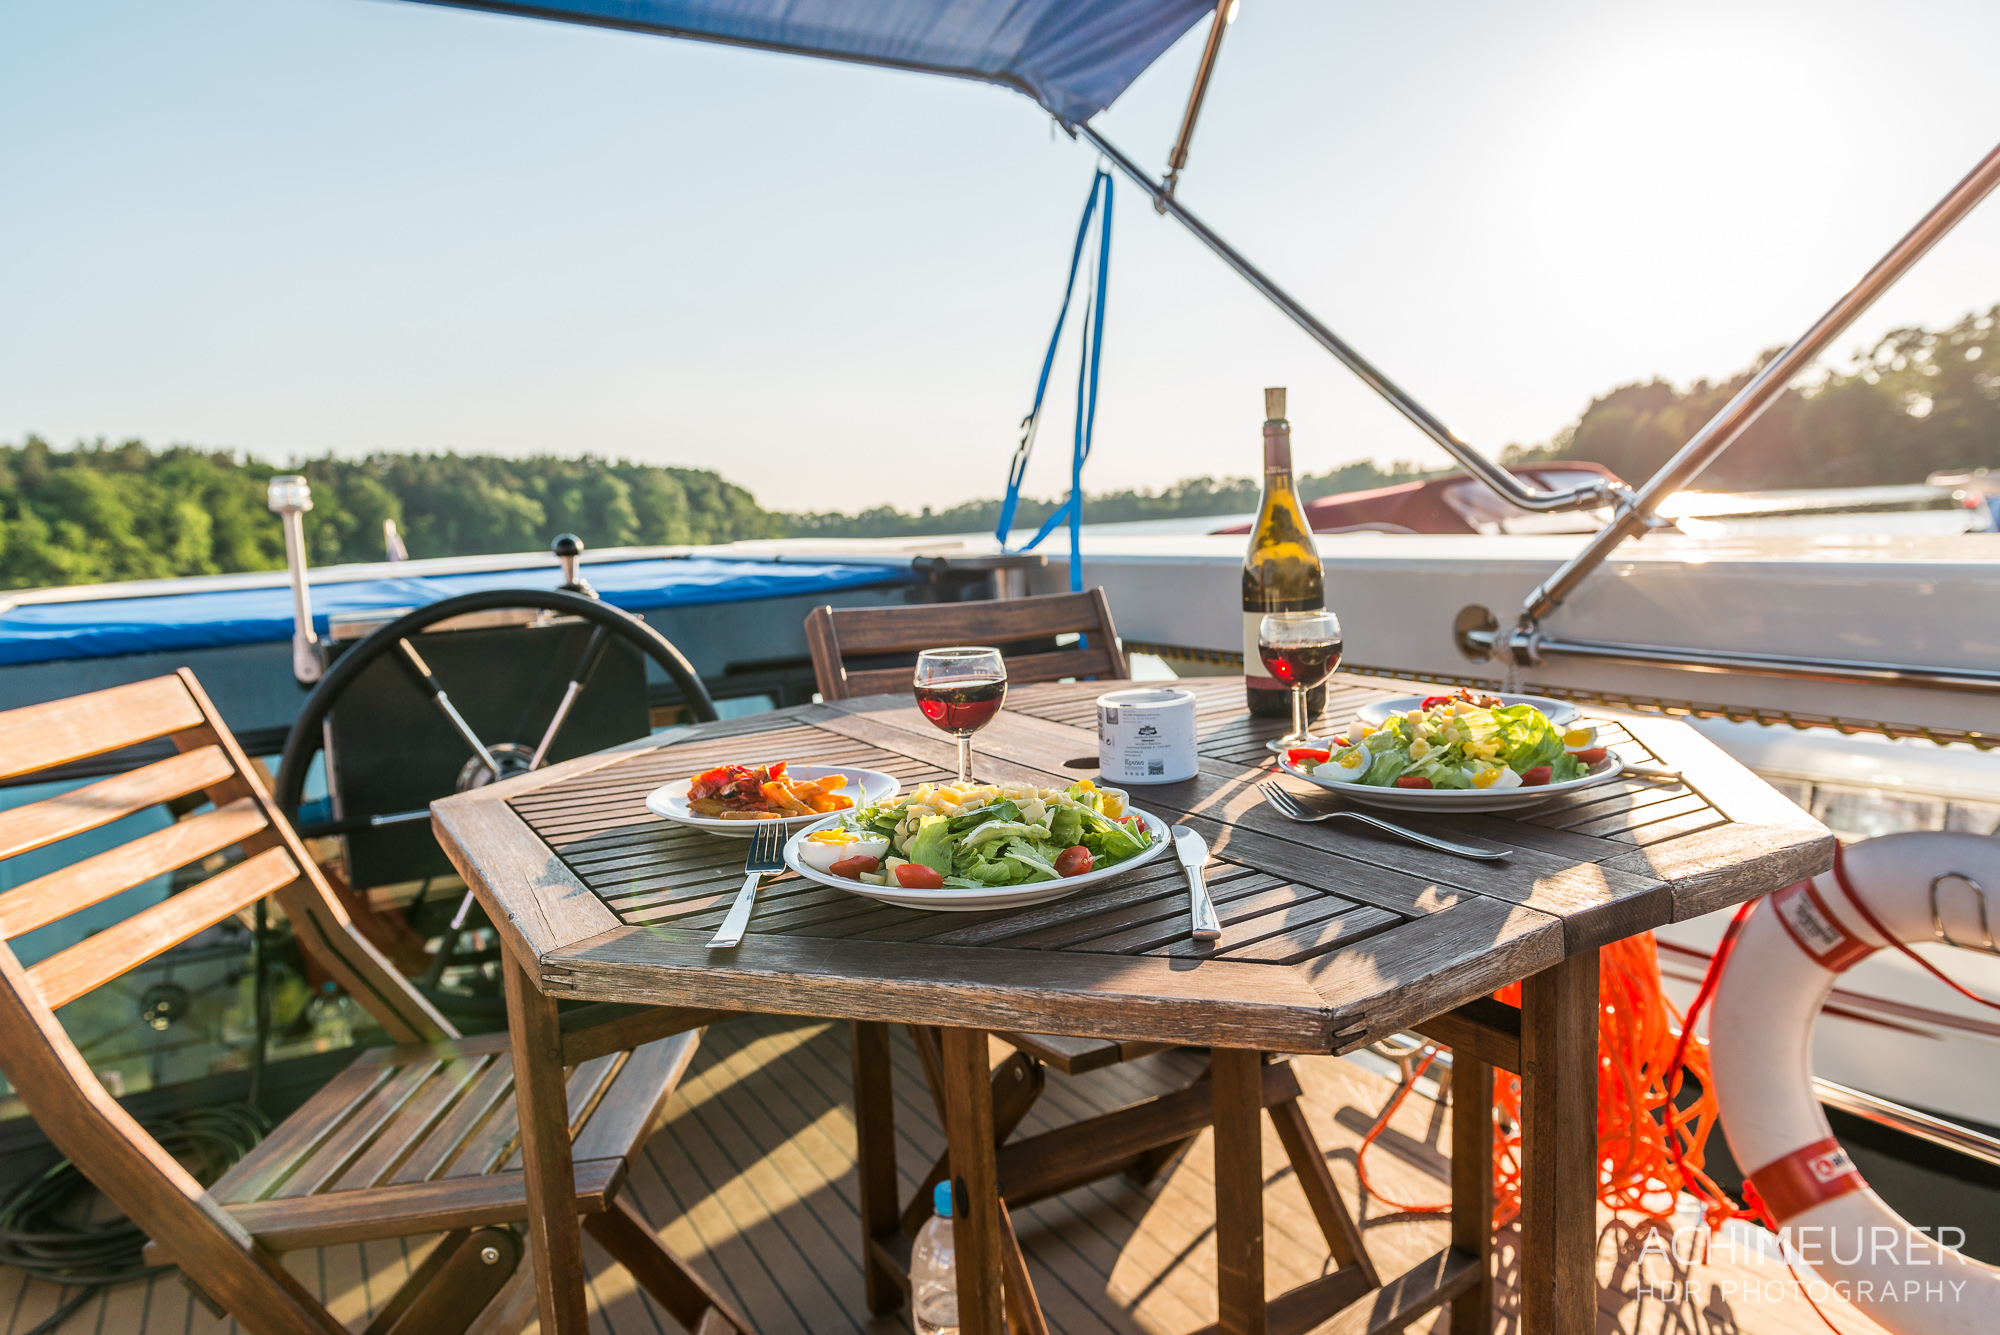 Hausboot-Kuhnle-Mueritz-Mecklenburg-Vorpommern-See_3112